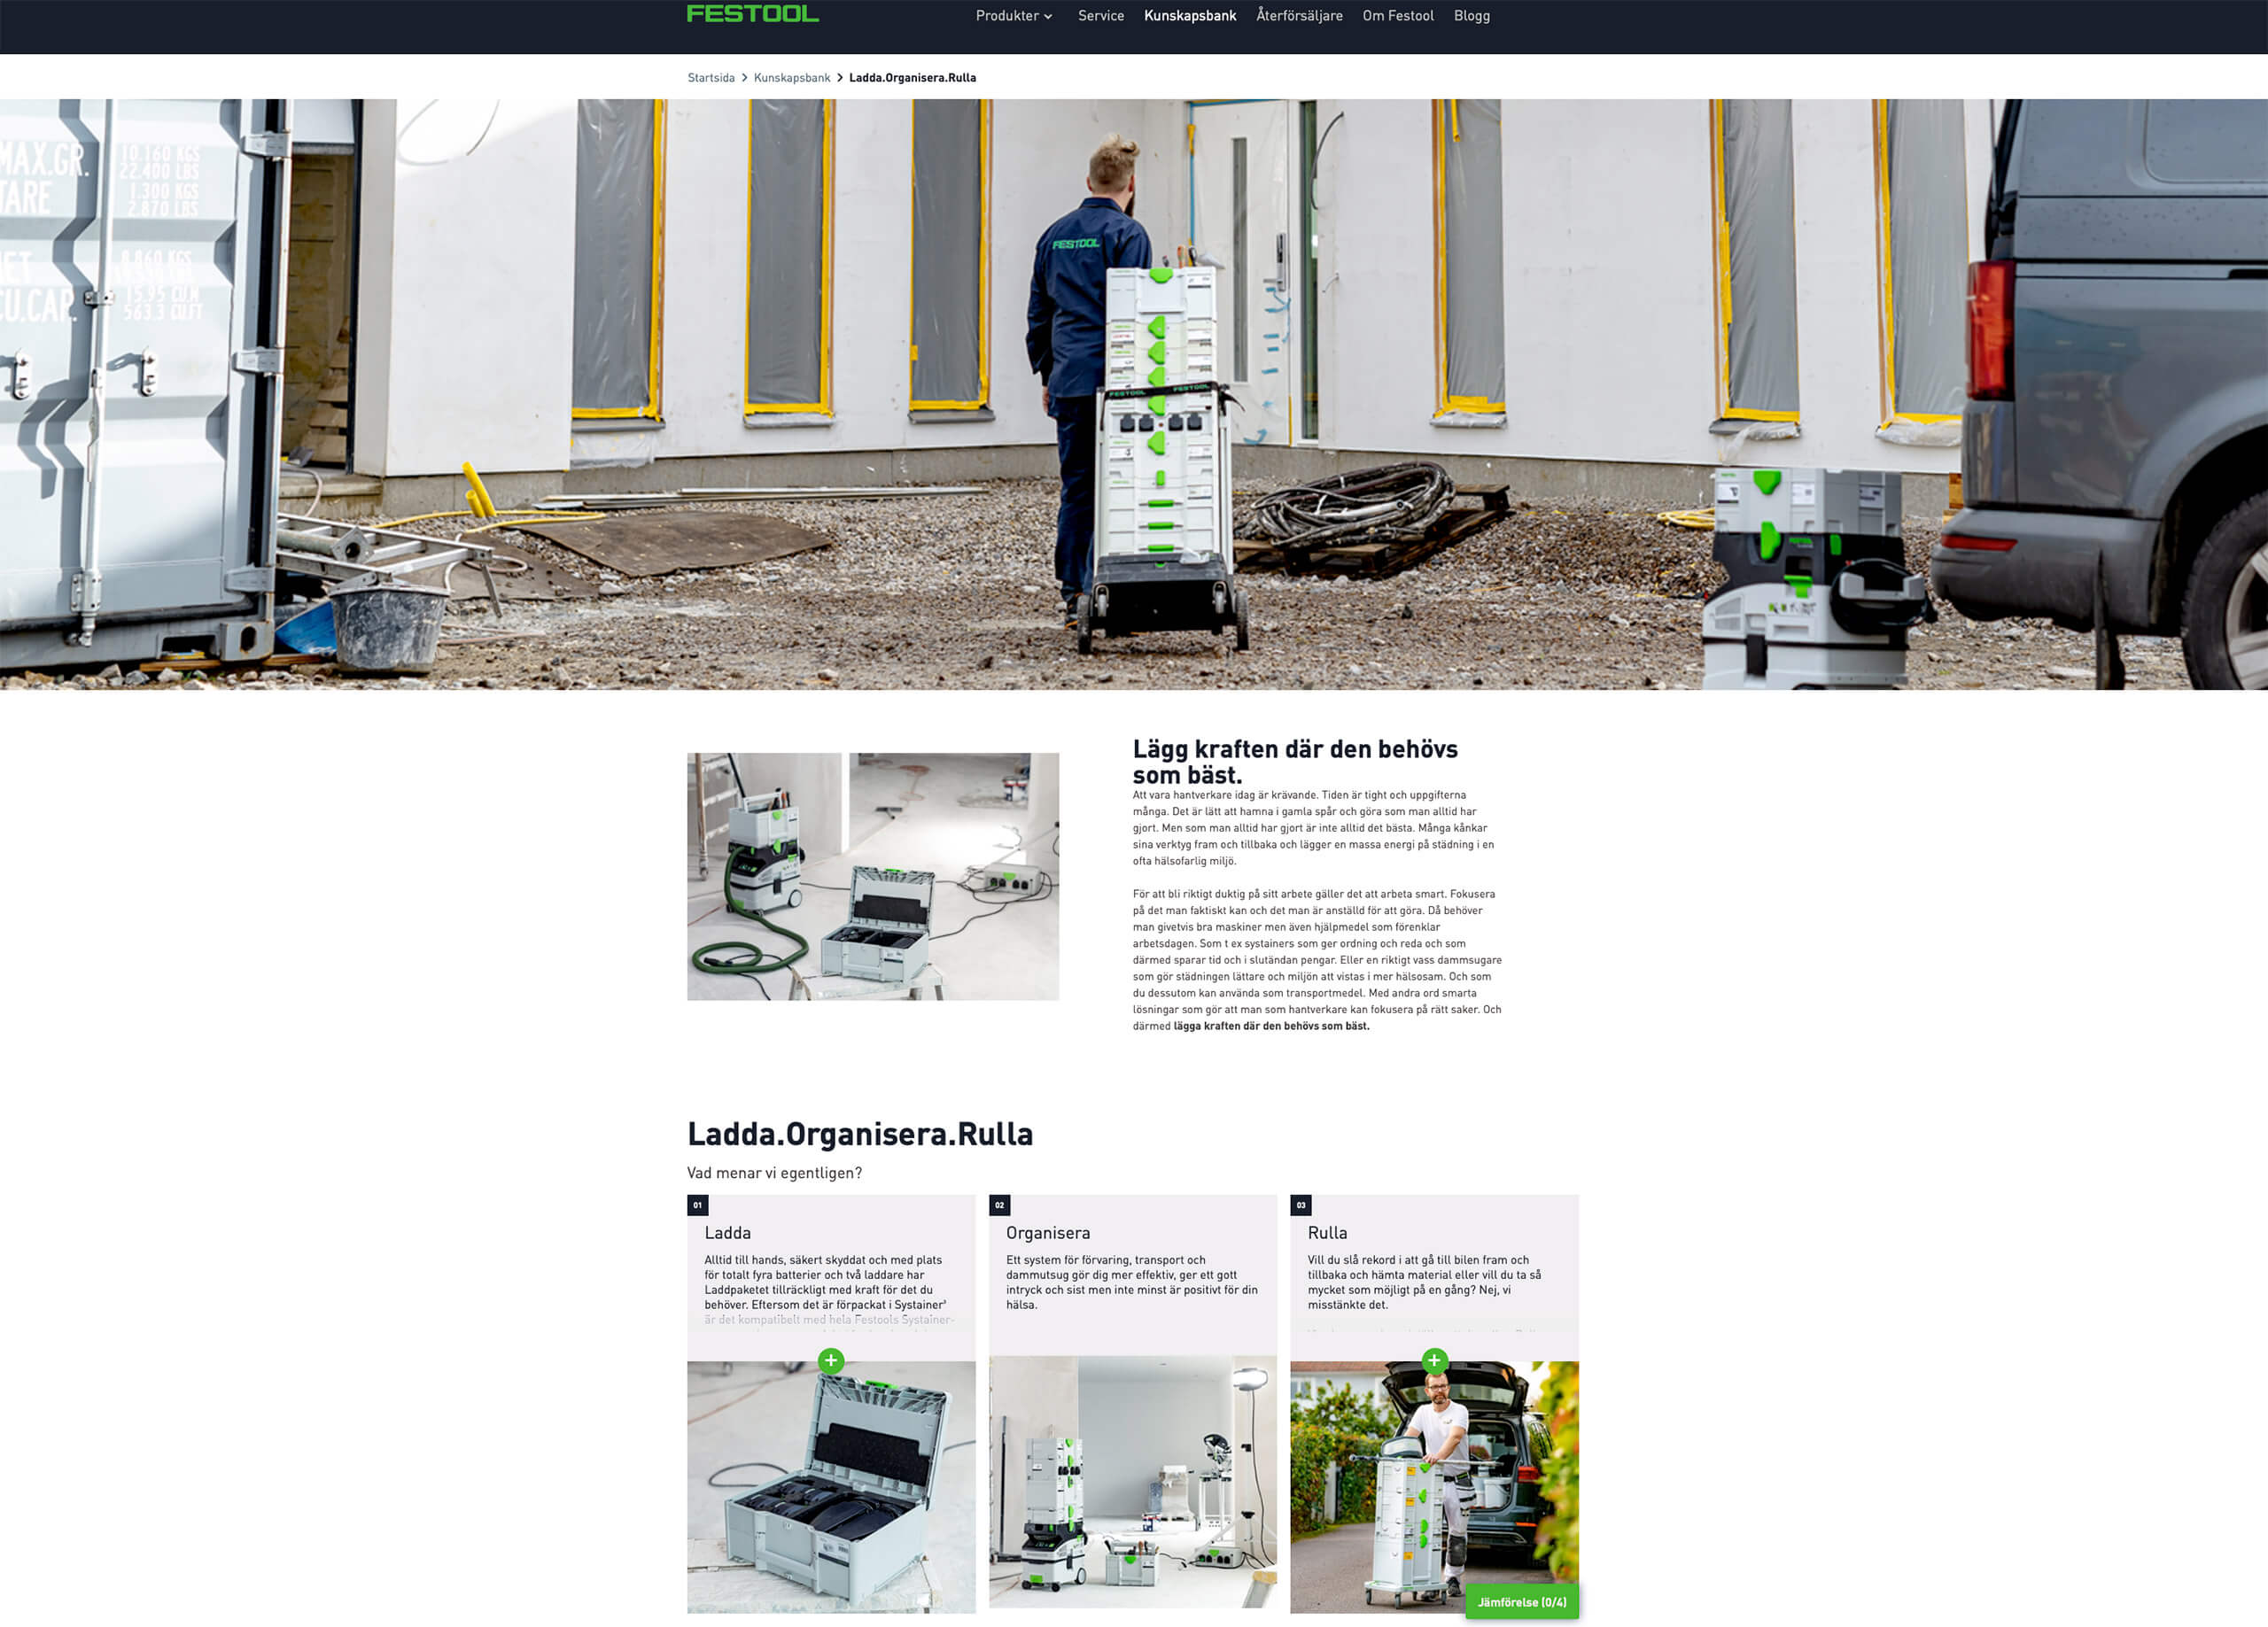 Image from Festool website